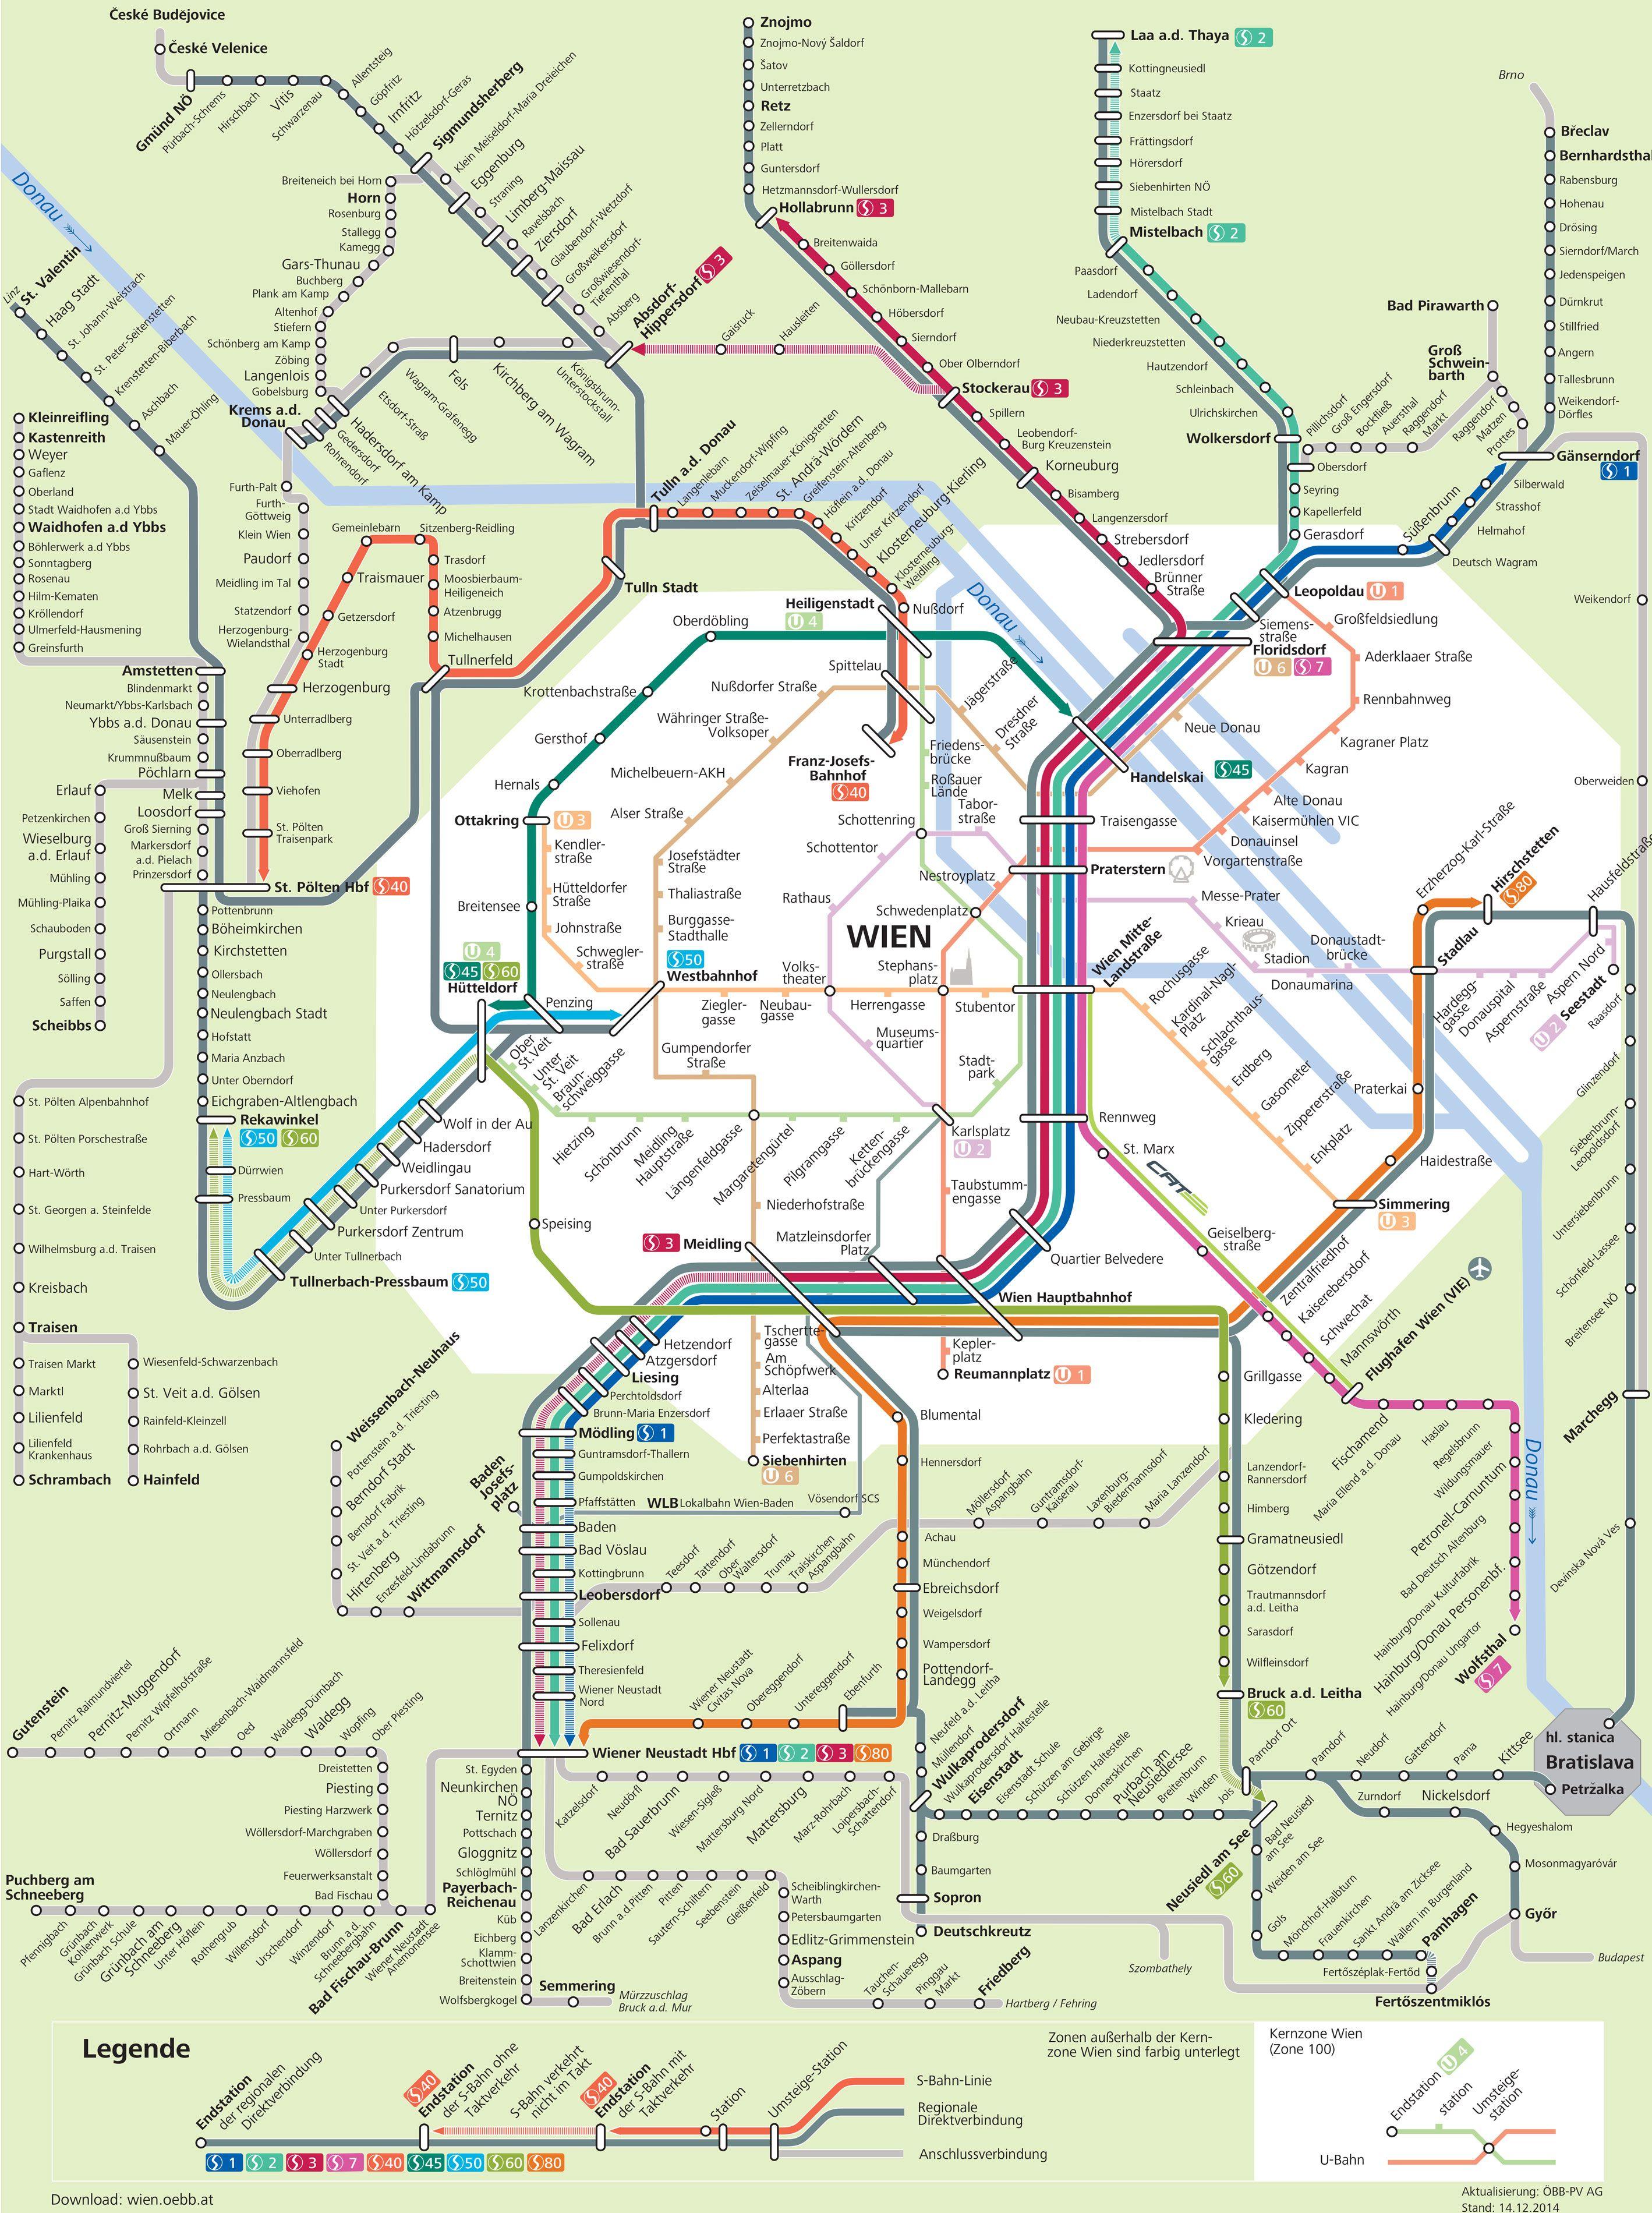 Atlanta Transit Fantasy Map MARTA Subway Light Rail BRT - Portugal rail map pdf